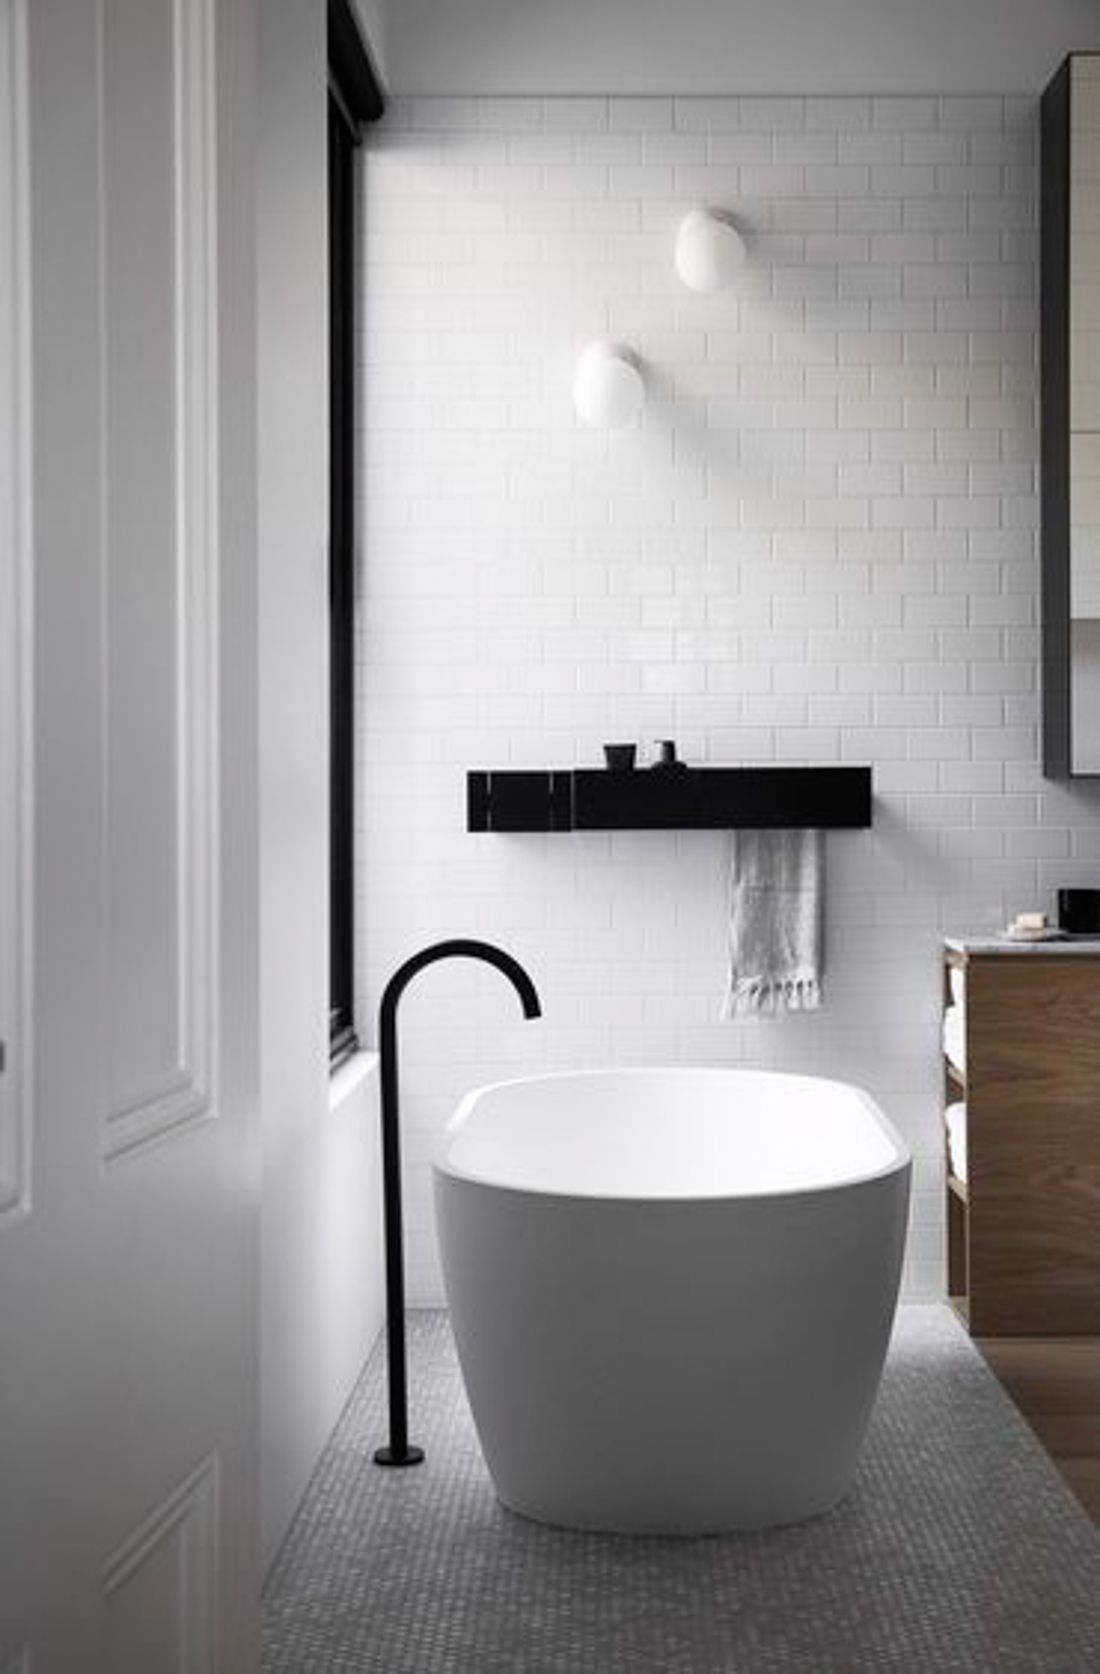 Bathroom Goals: 10 Amazing Minimal Bathrooms | Minimal bathrooms ...